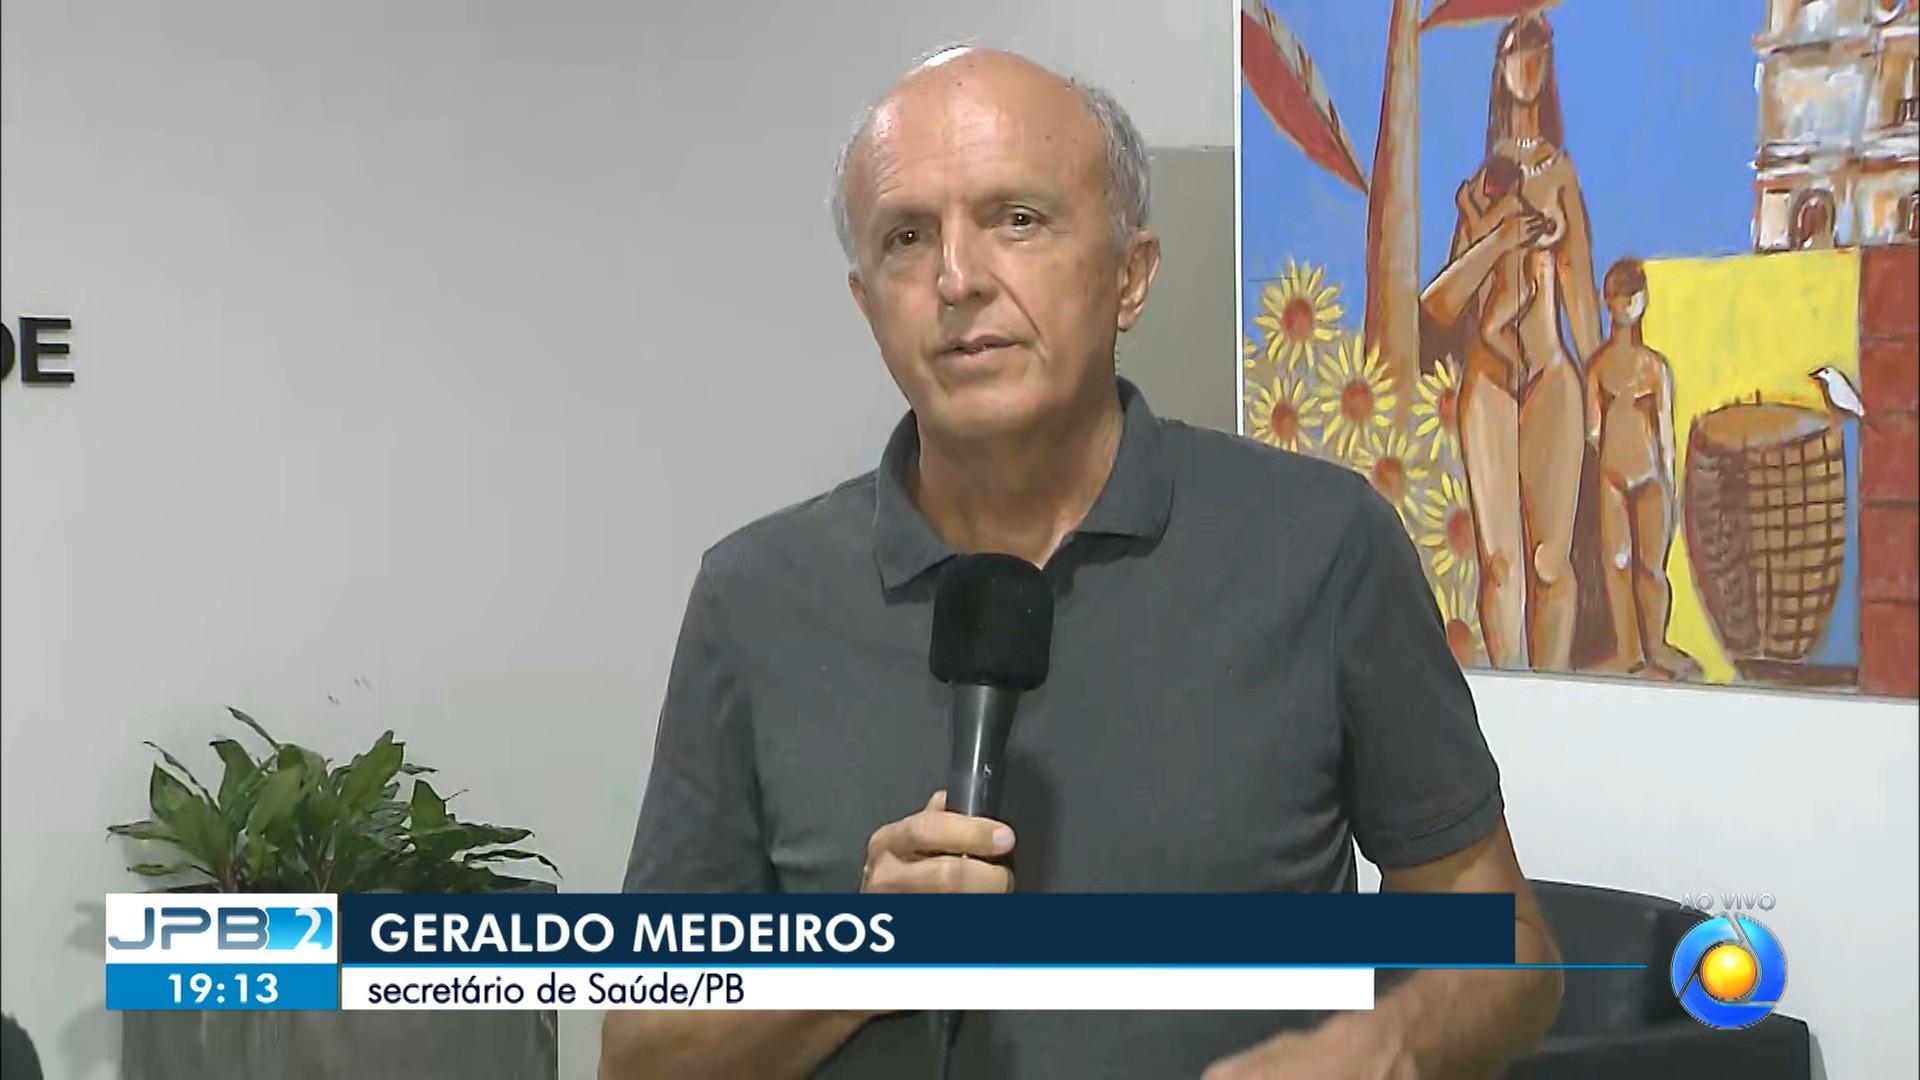 VÍDEOS: JPB2 (TV Cabo Branco) desta terça-feira, 31 de março